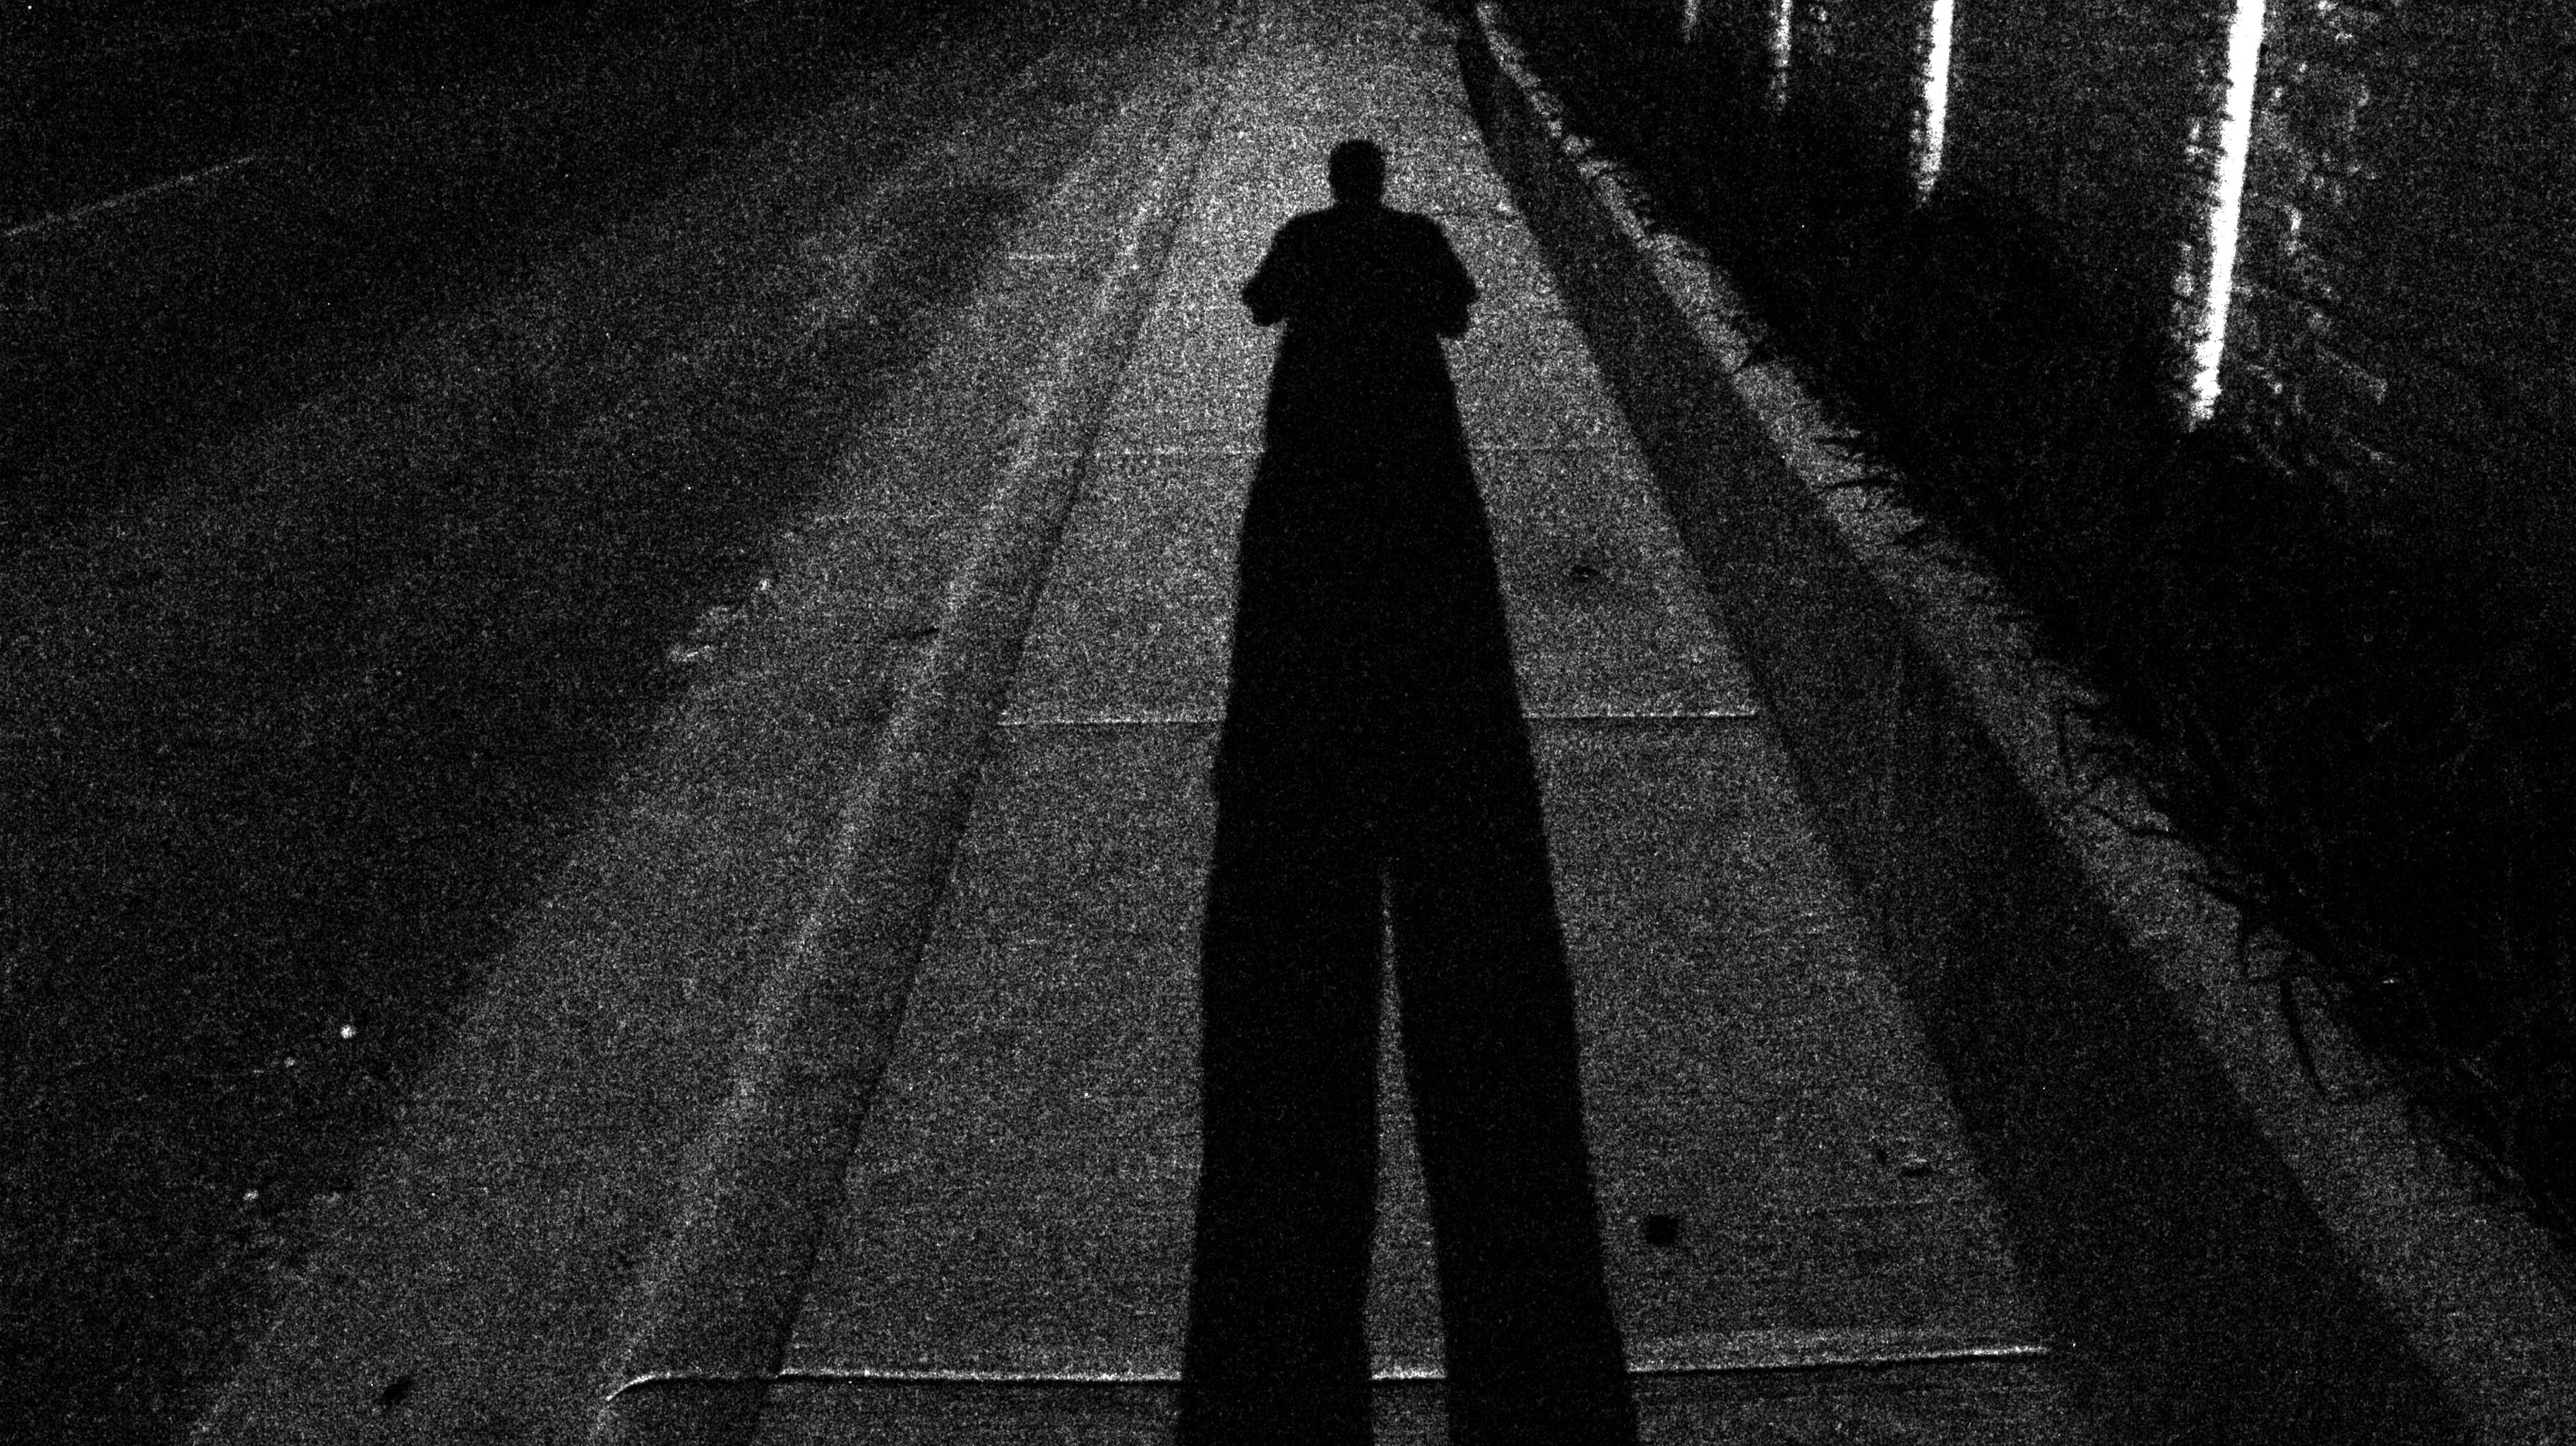 Shadow photo